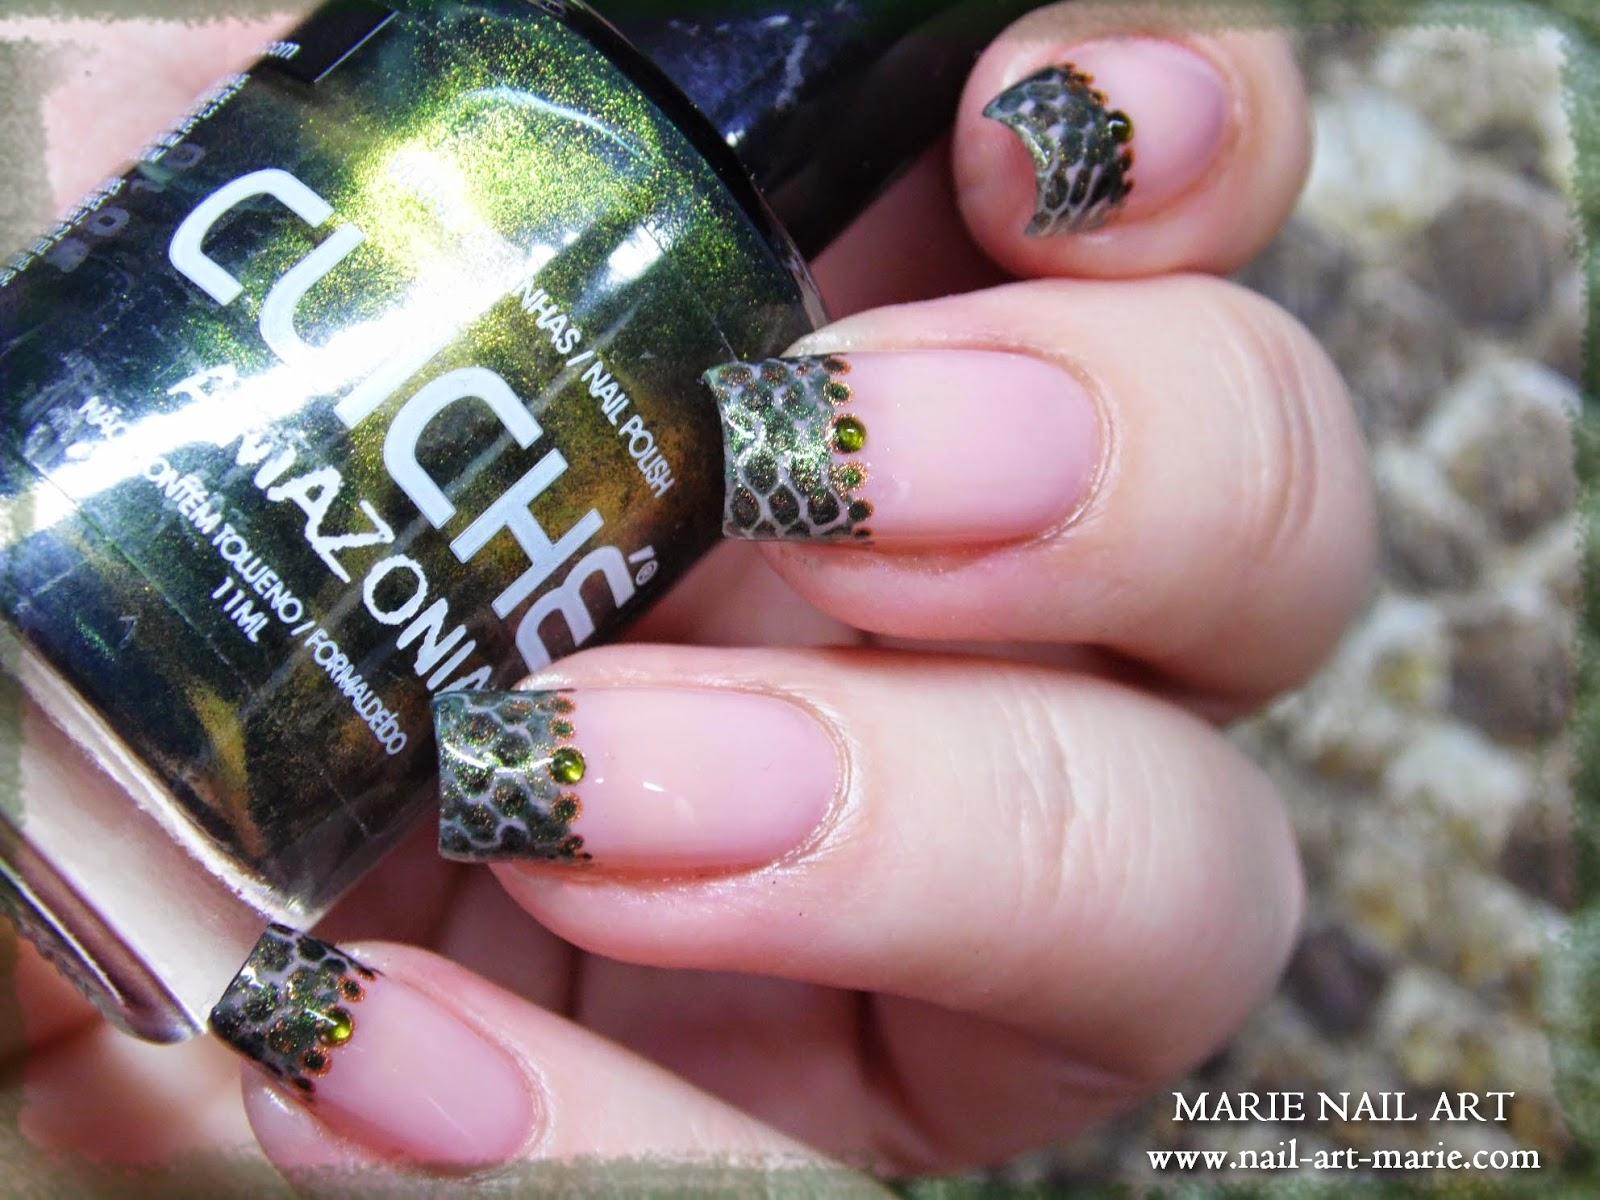 nail art effet peau de serpent12